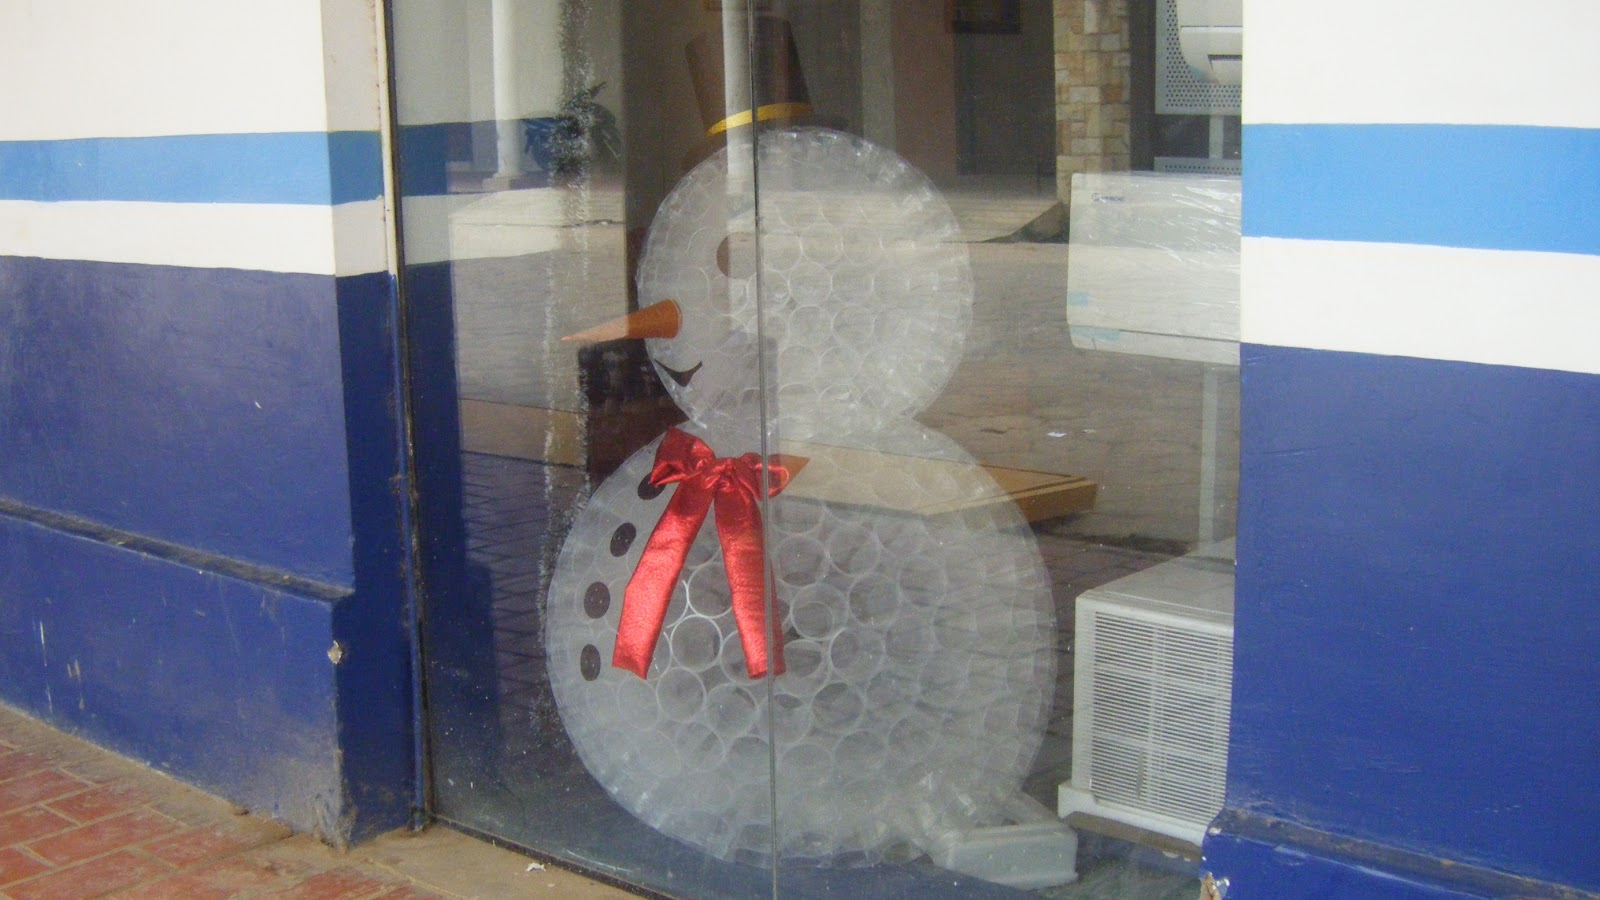 bonhommes de neige en gobelet